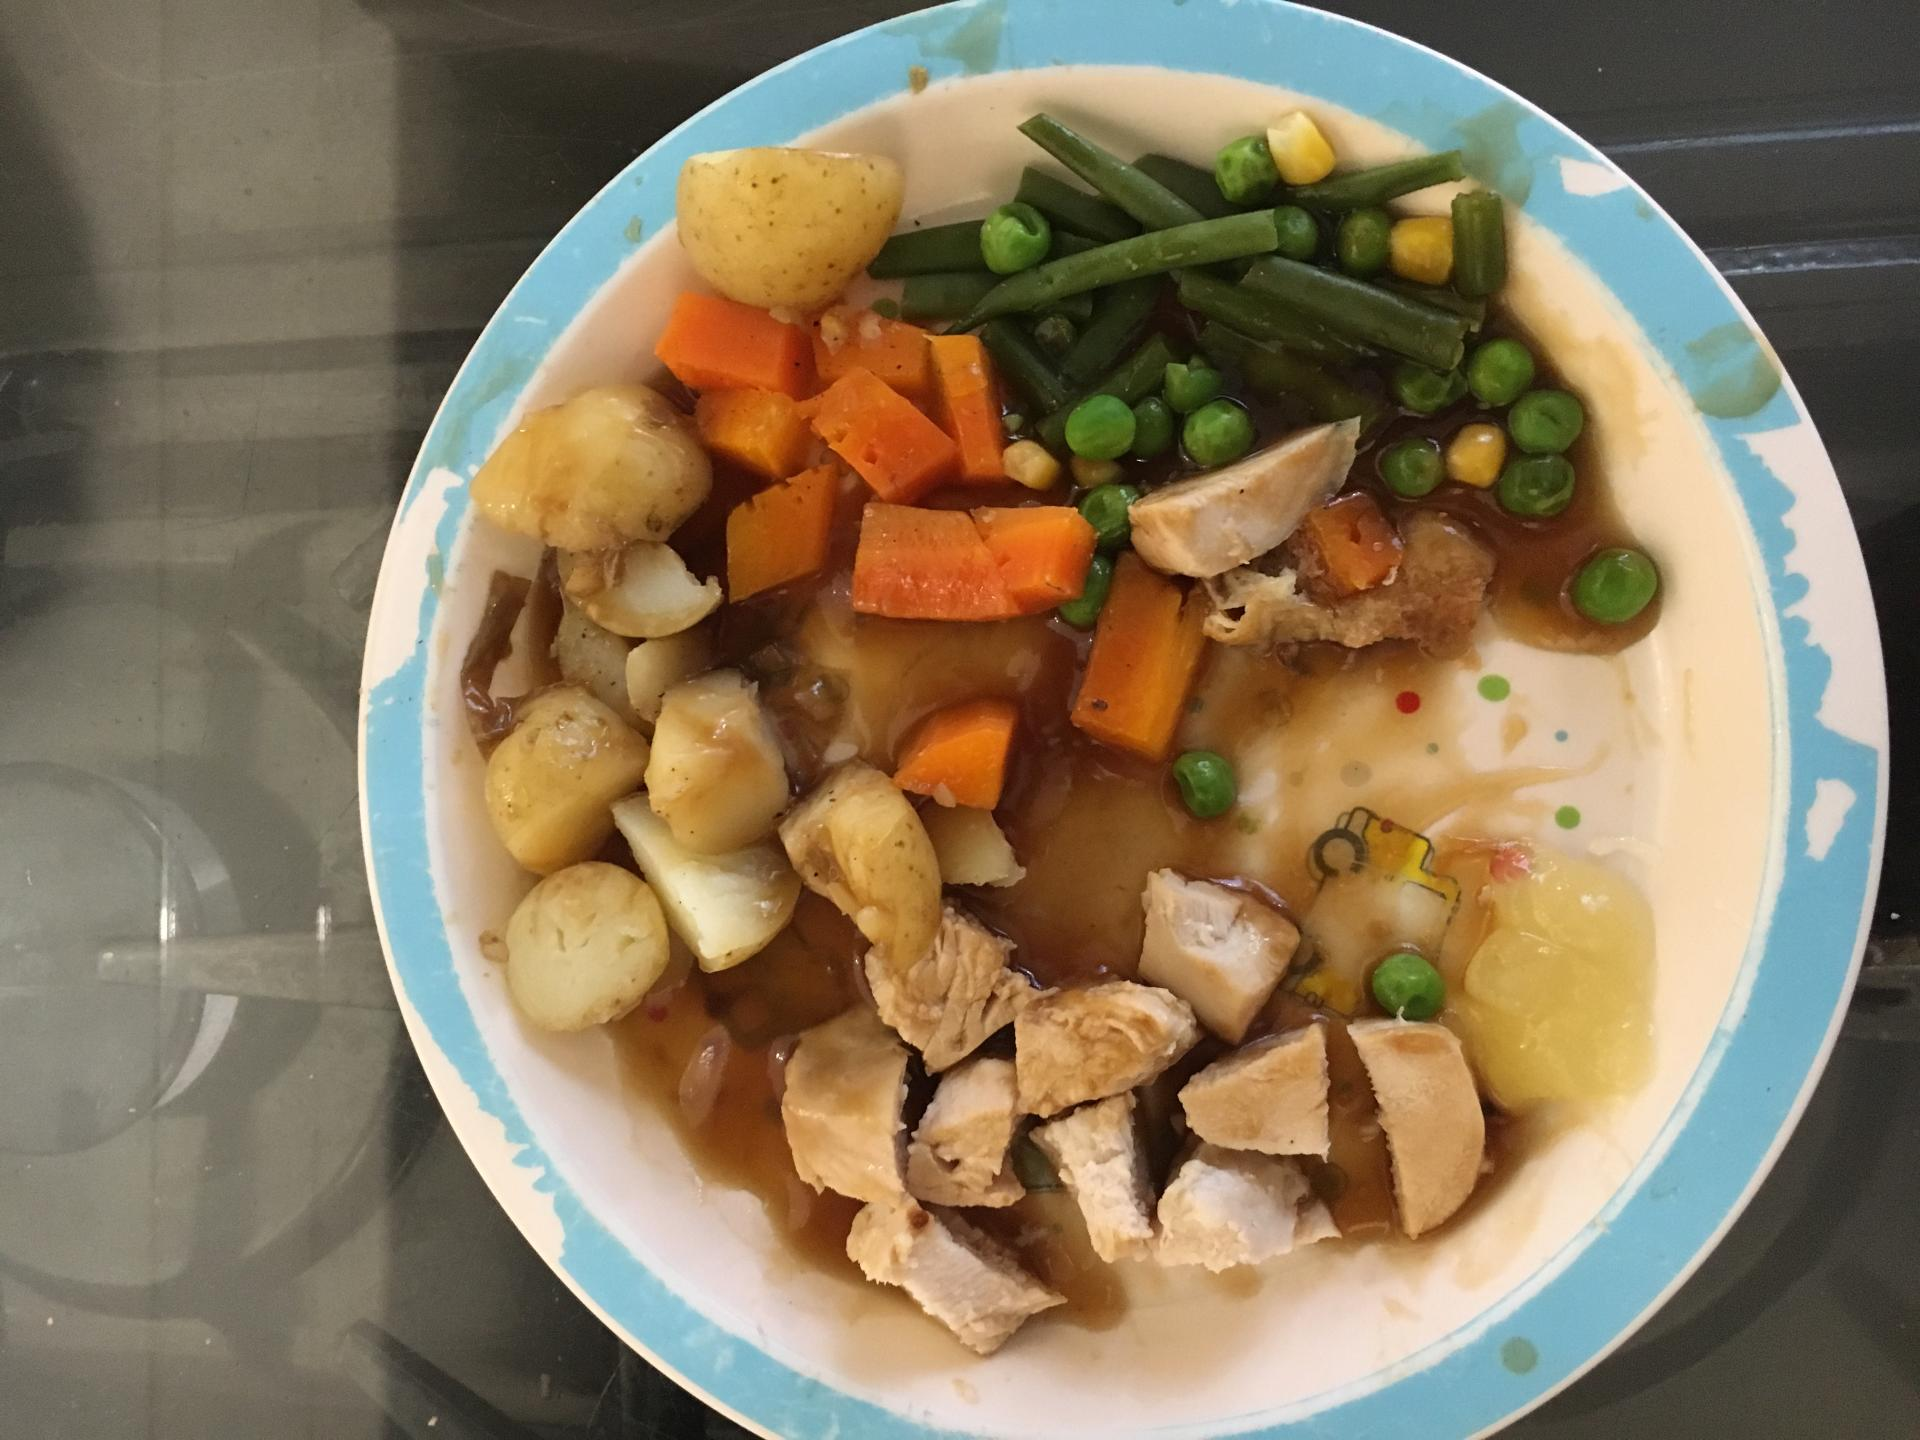 Toby's meal uneaten